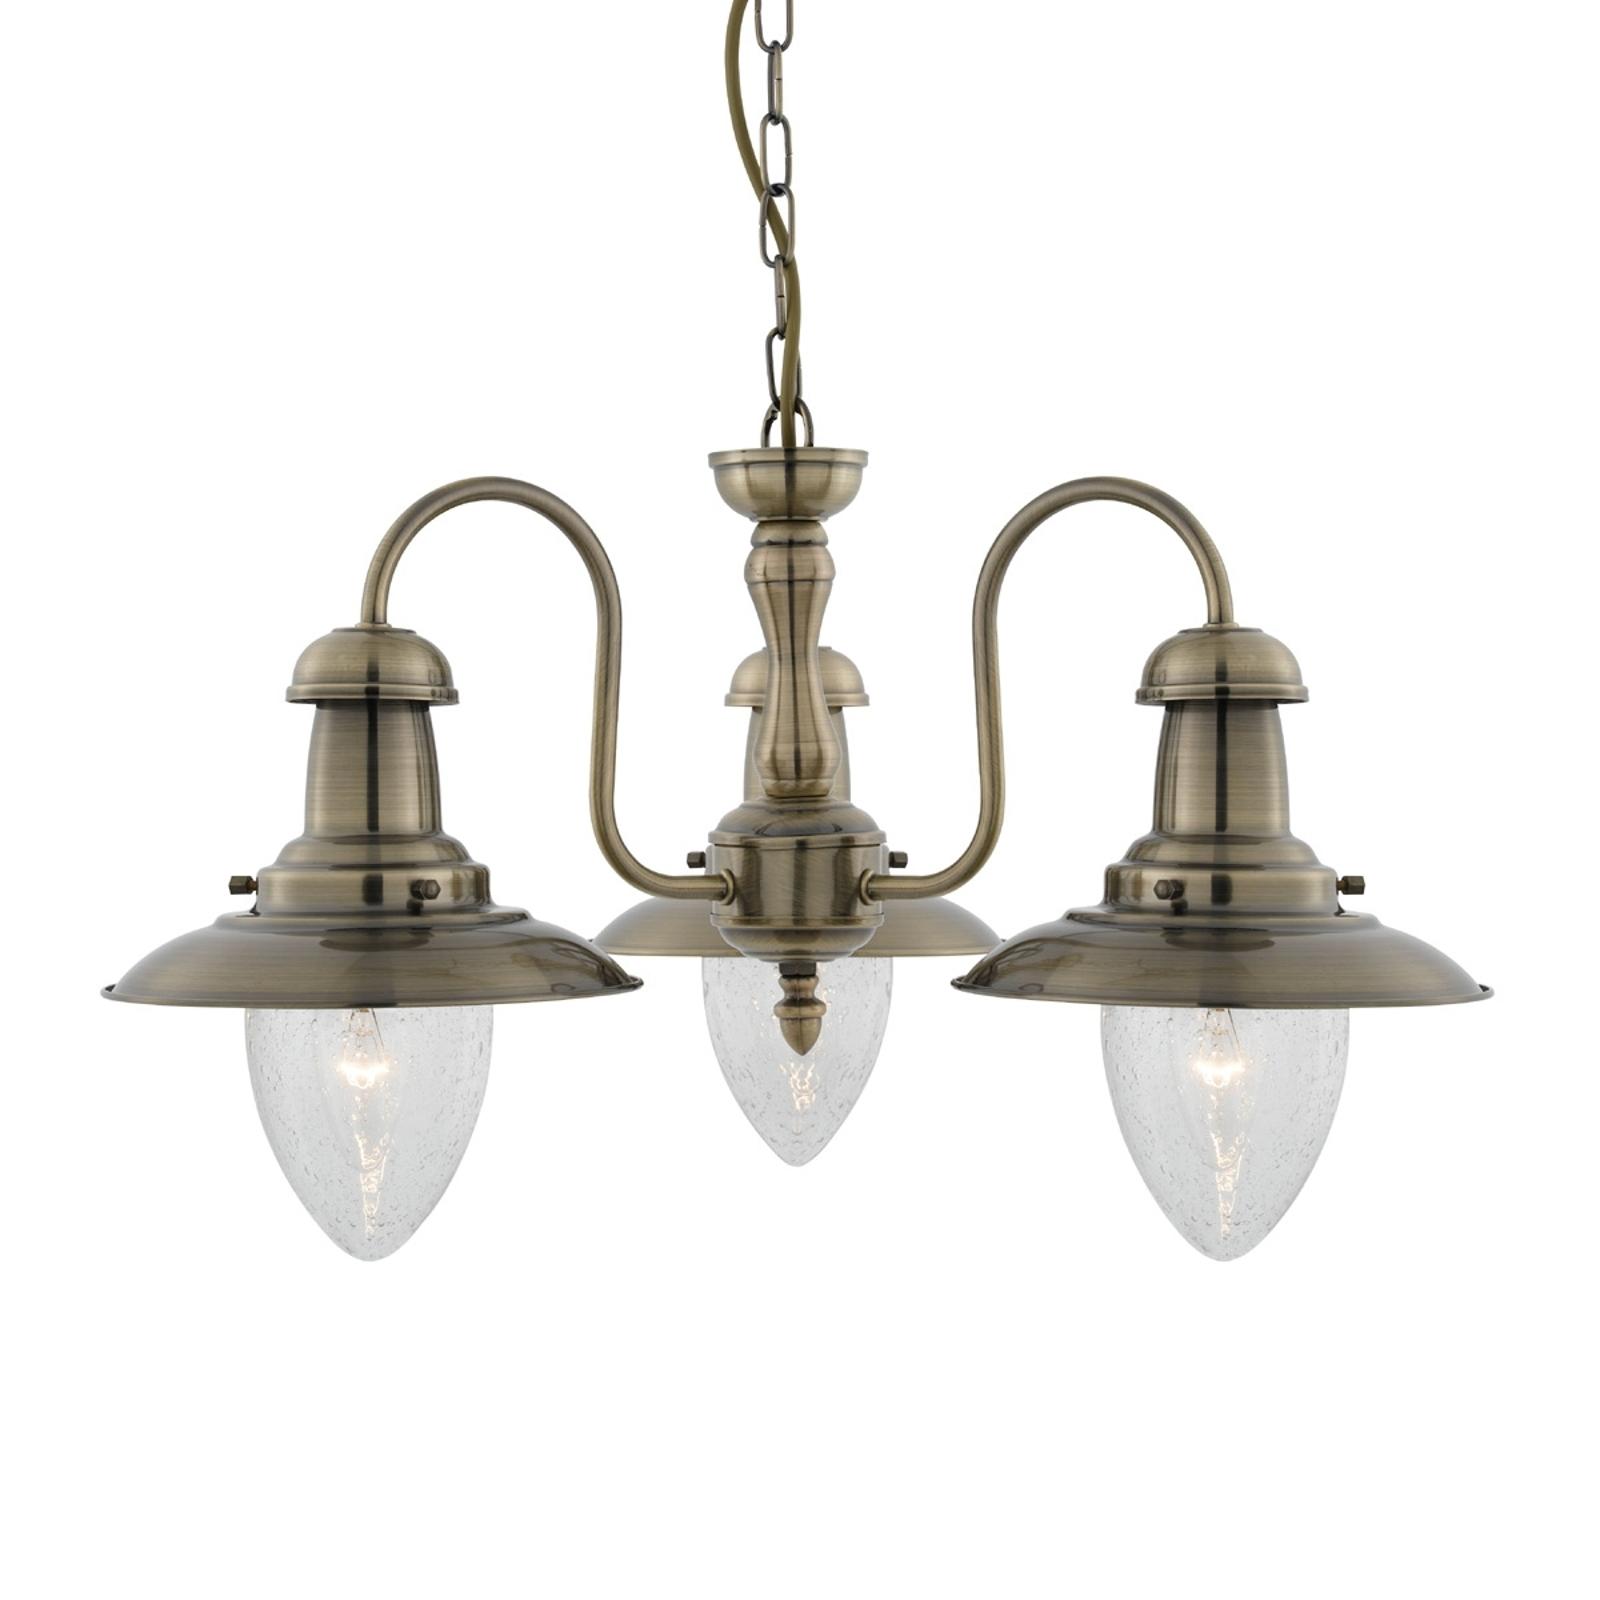 Hanglamp Fisherman, met 3 lampjes in oudmessing